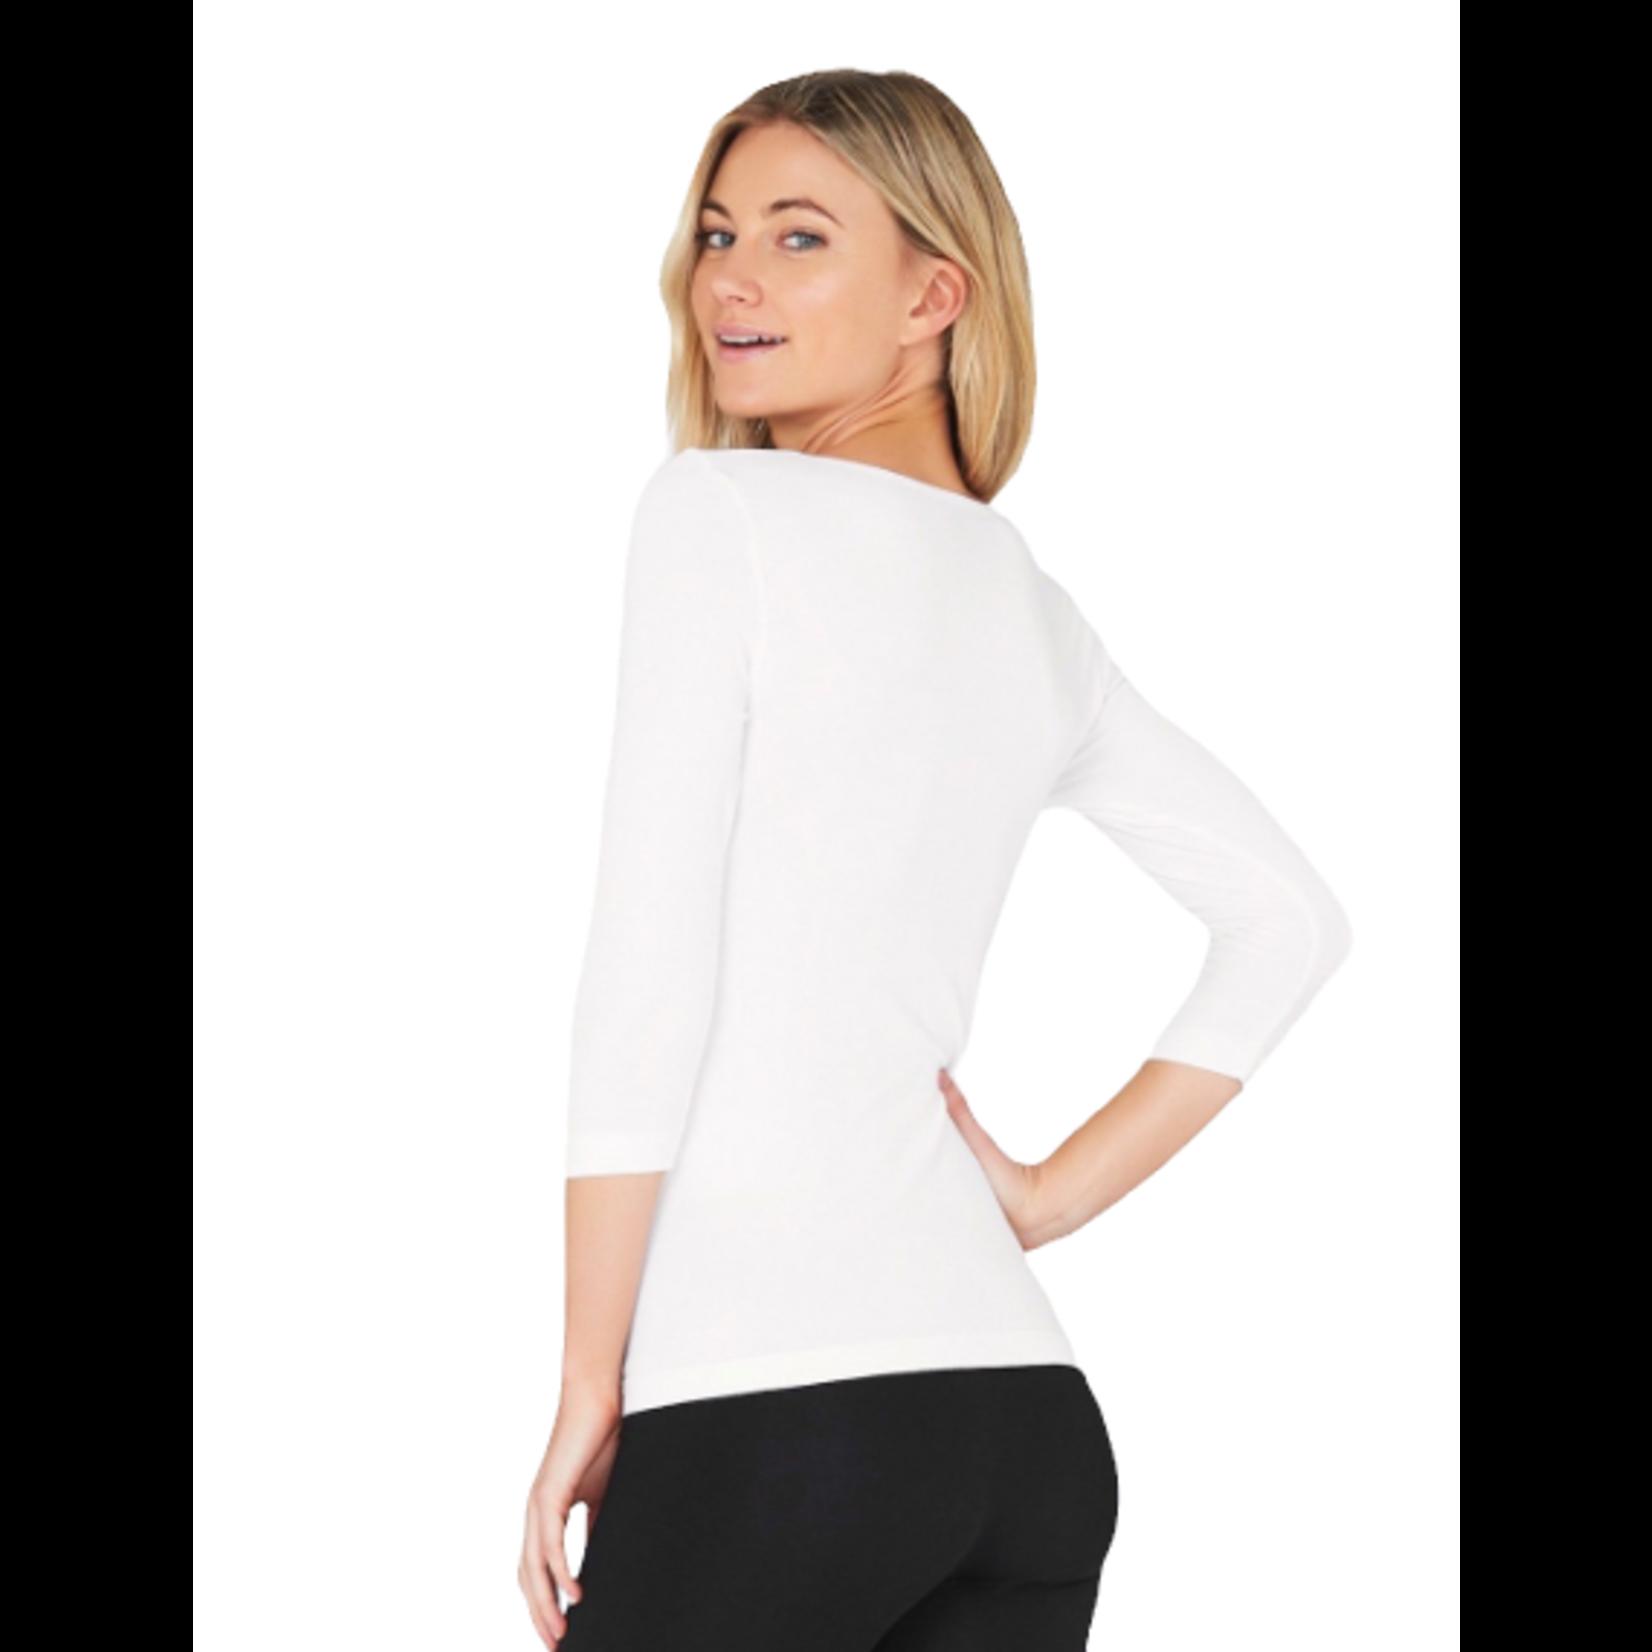 Boody Boody Women's 3/4 Sleeve Top